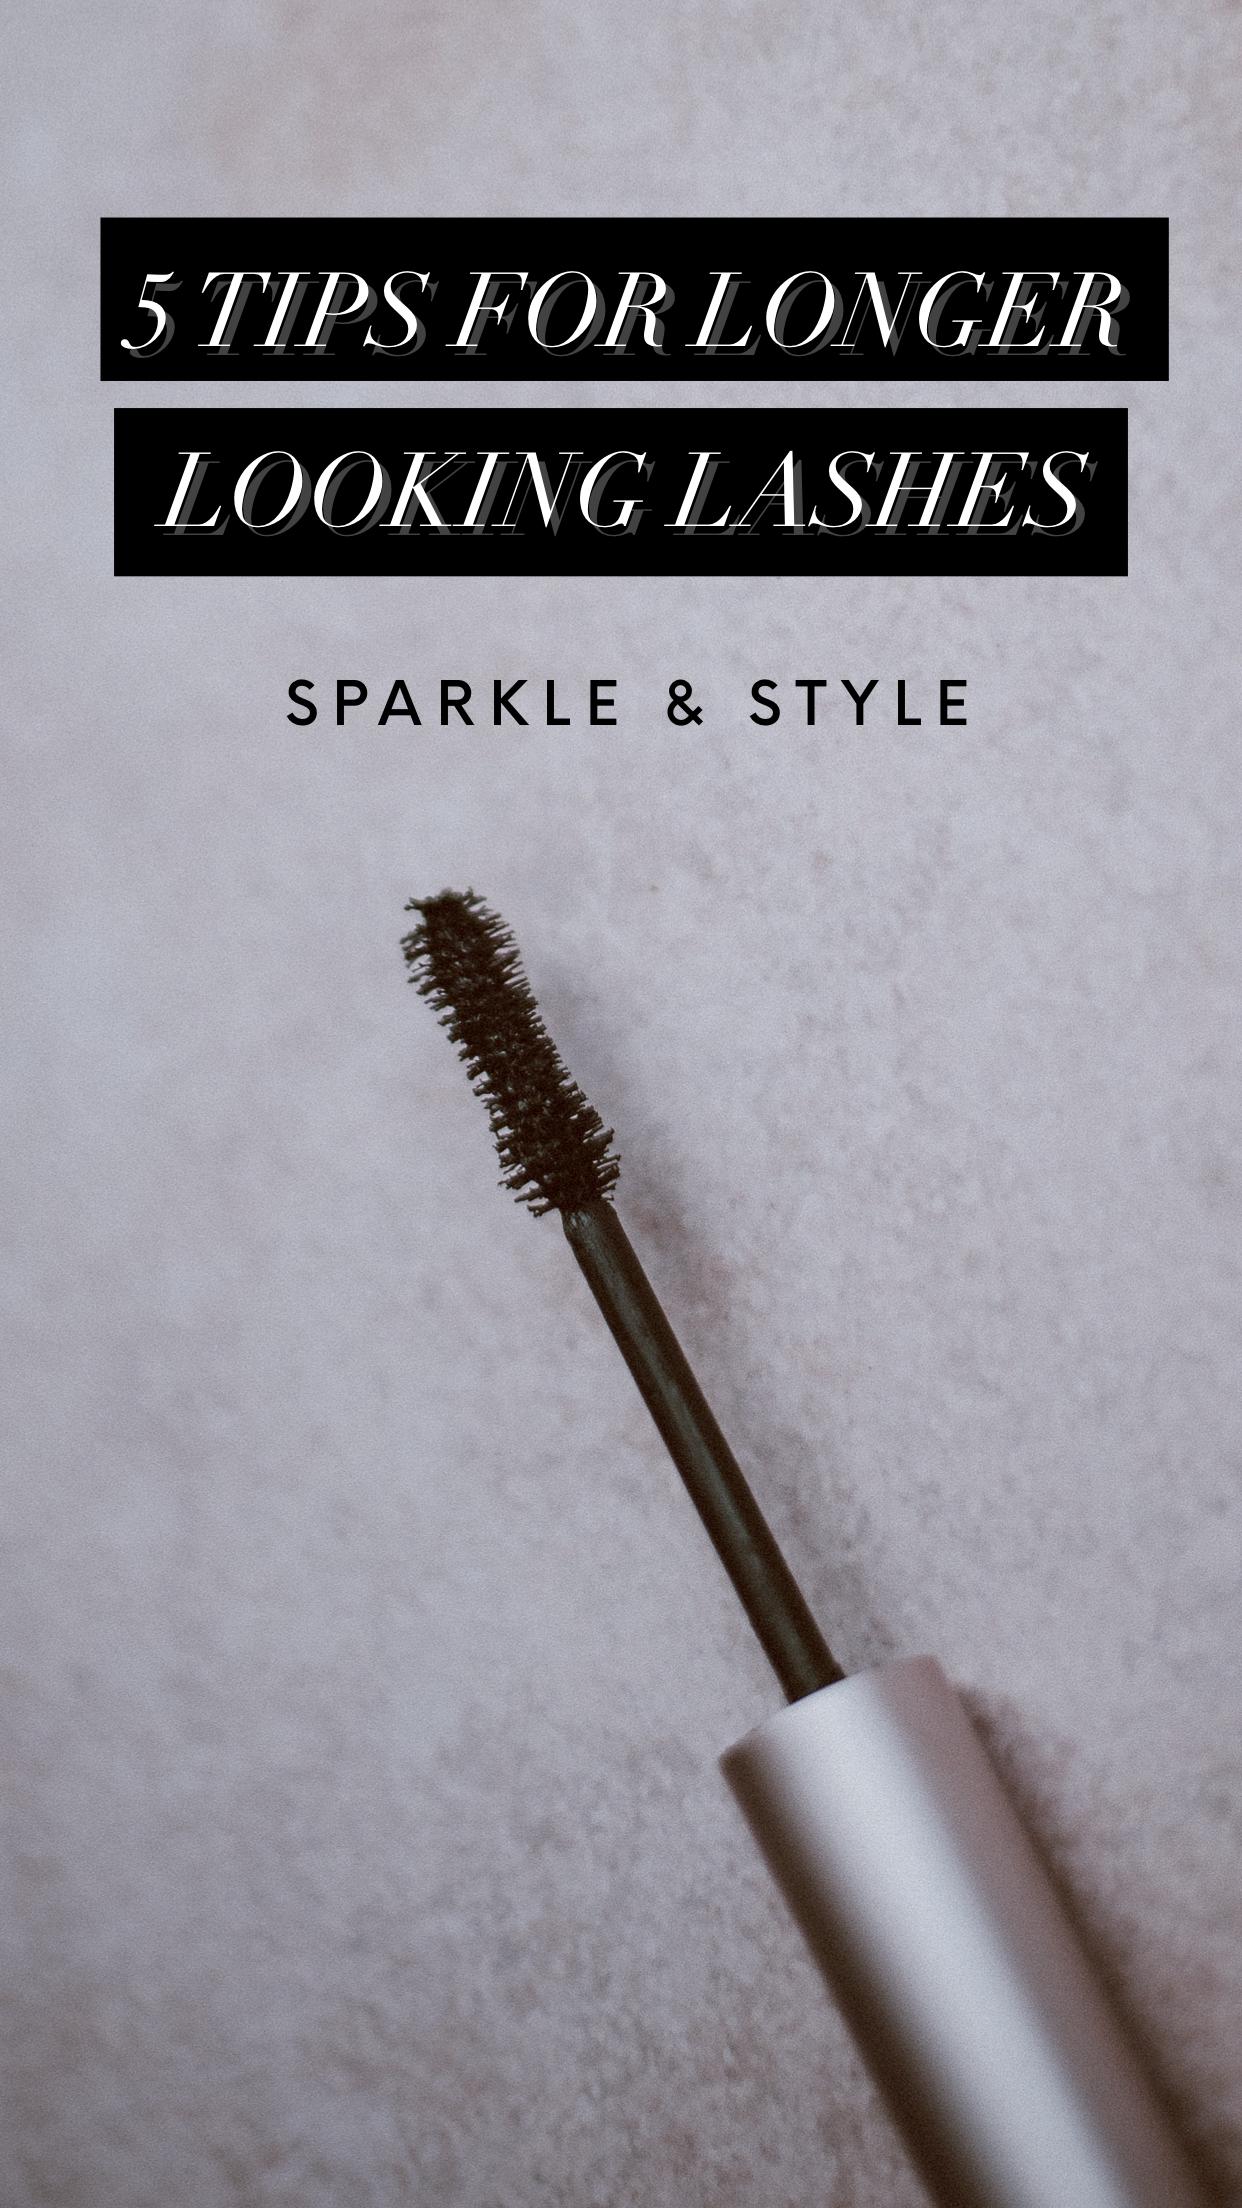 5 Tips For Longer Looking Lashes Beauty hacks eyelashes